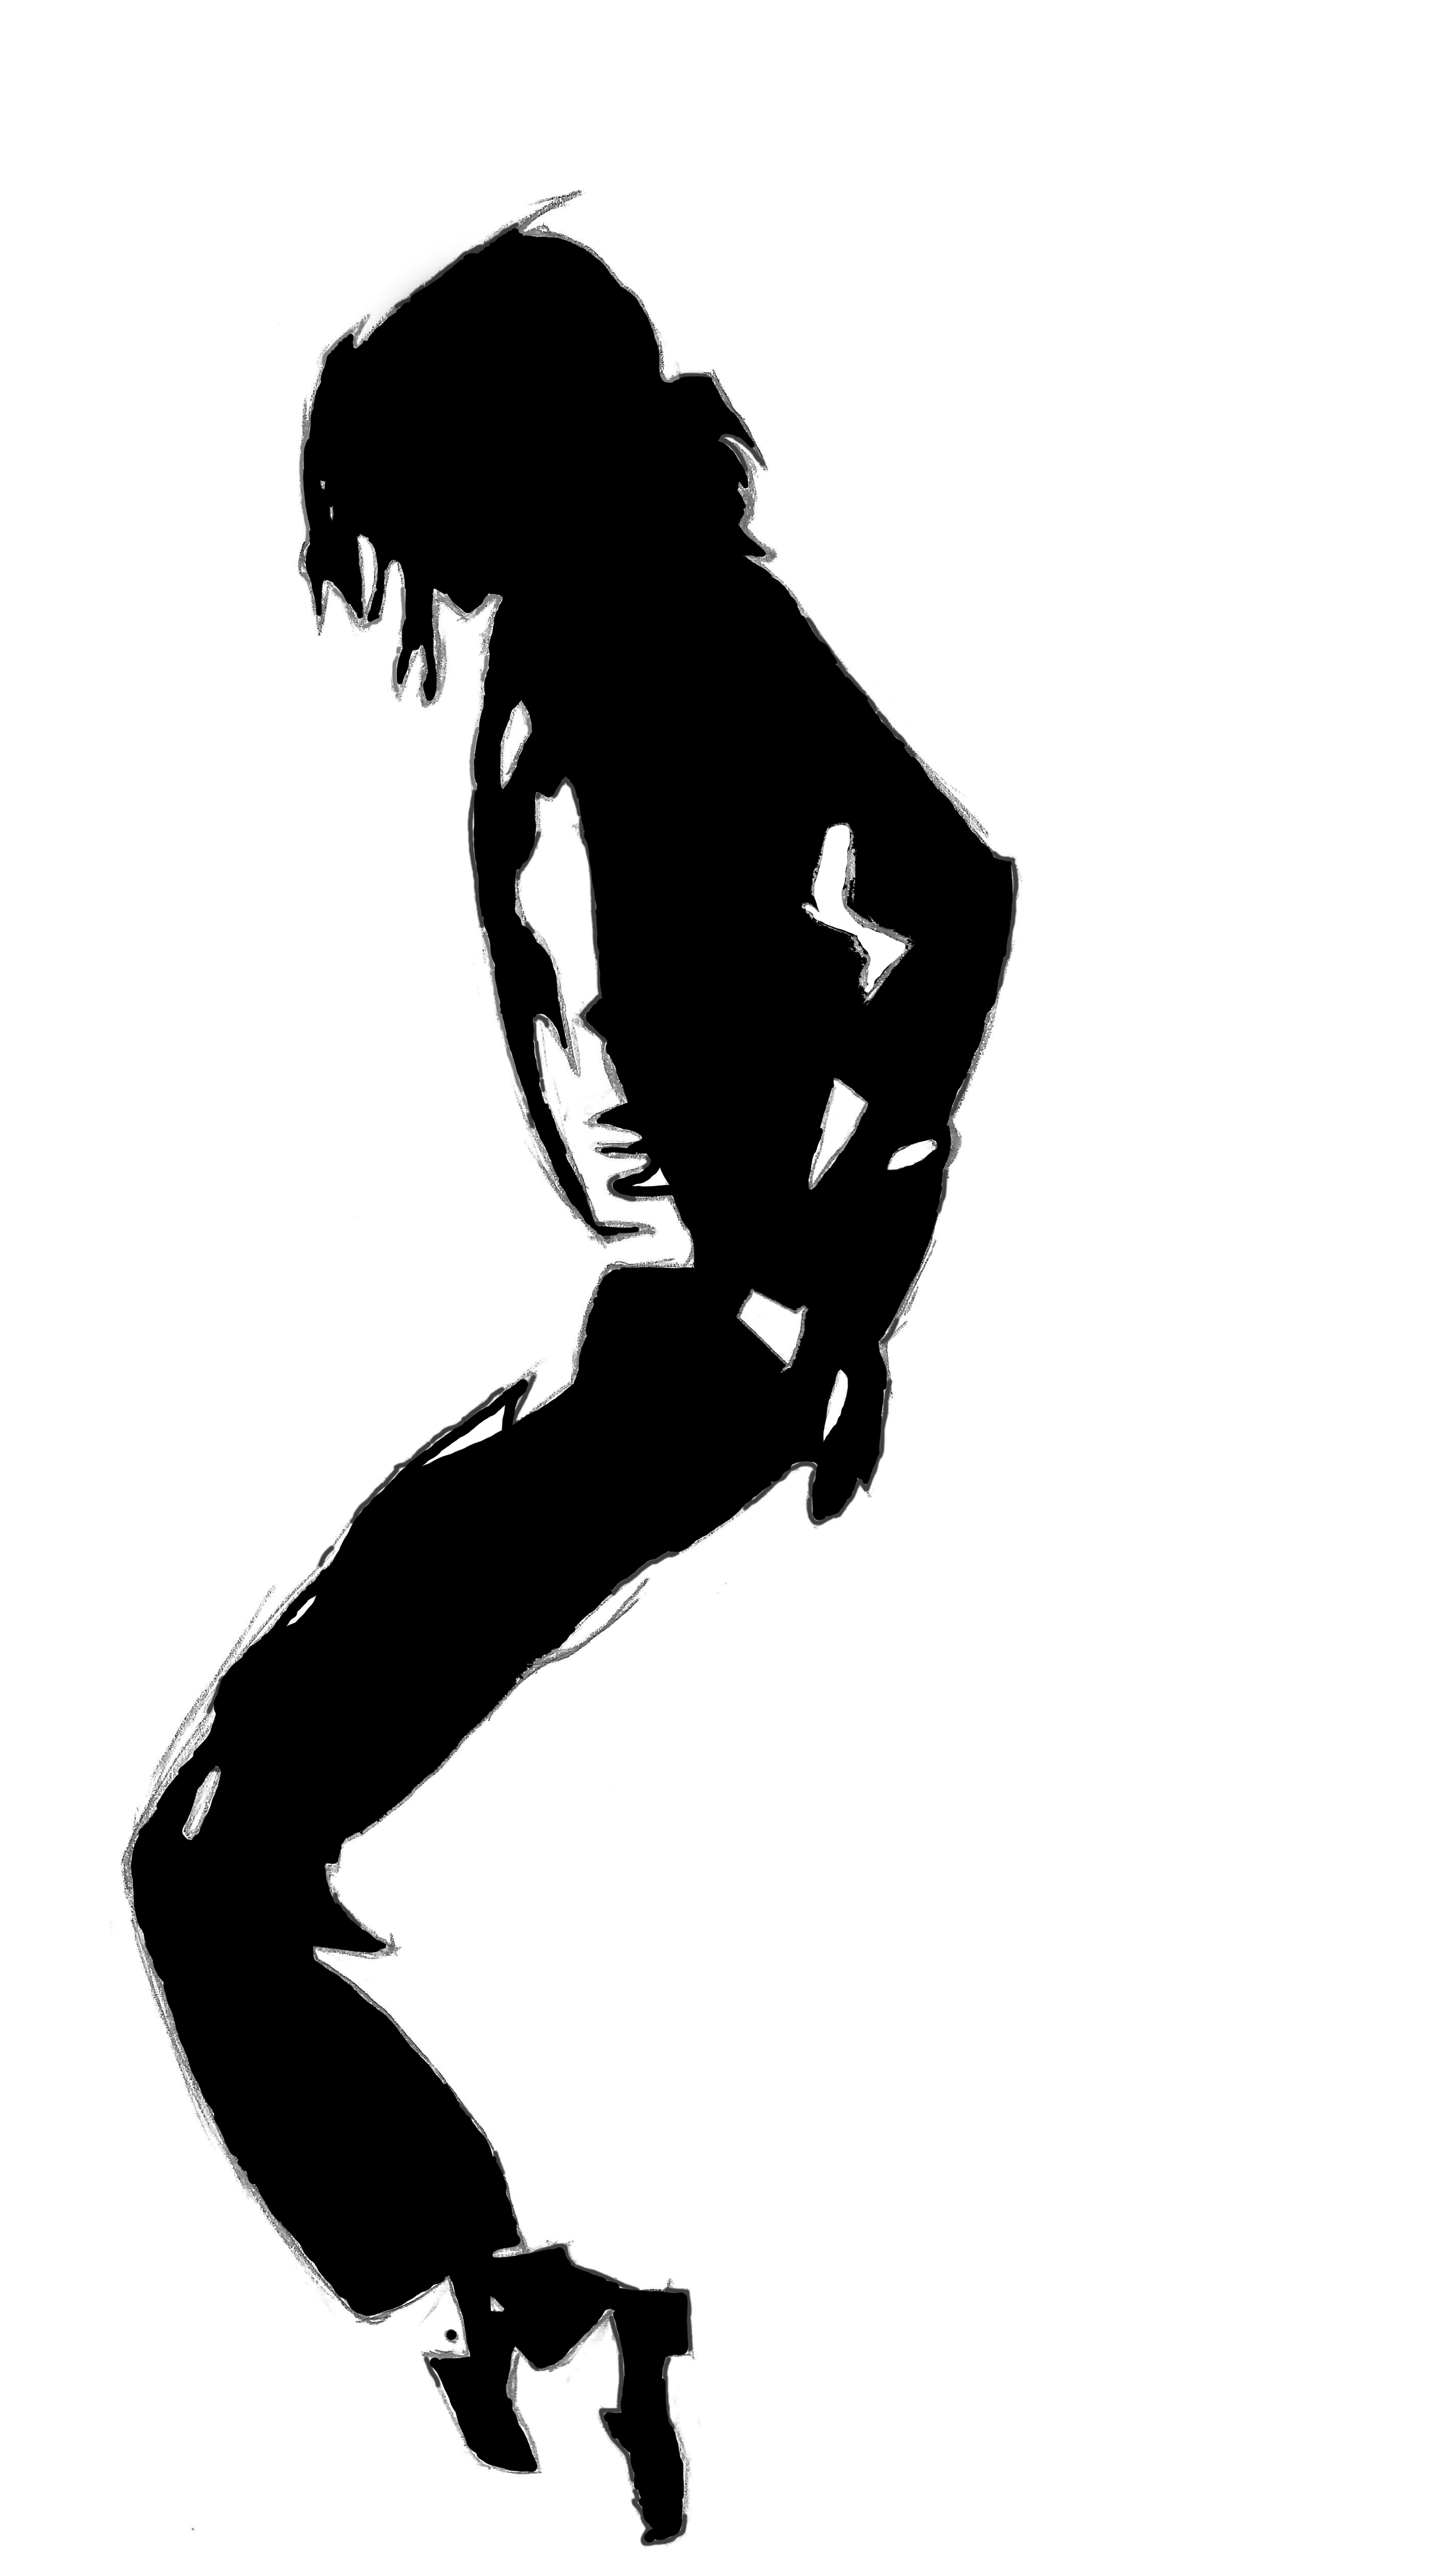 Michael Jackson Silhouette by Yggdrasil75 on DeviantArt